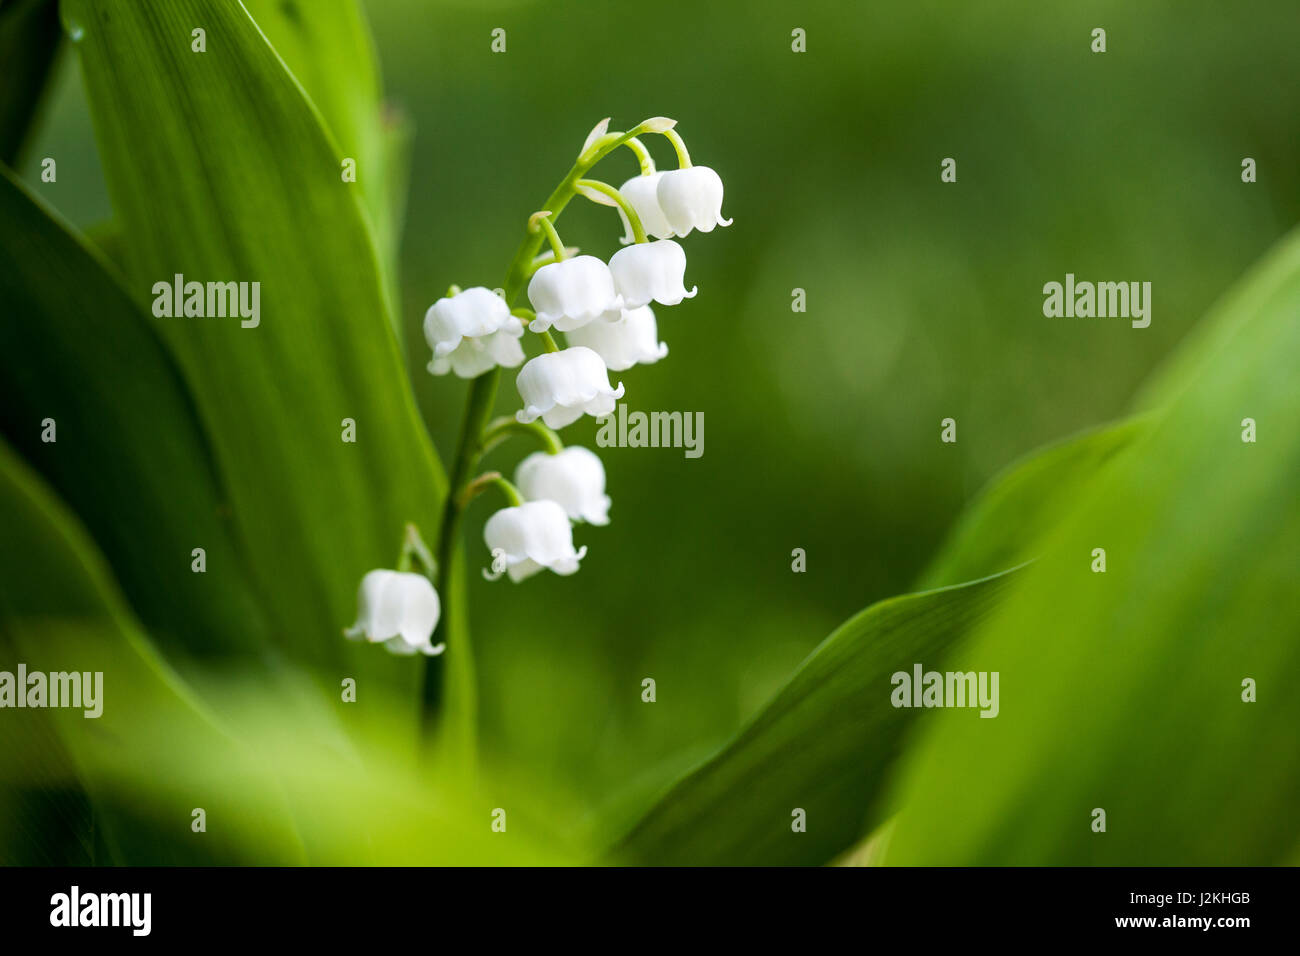 Lily of the Valley (Convallaria majalis) - North Carolina Arboretum, Asheville, North Carolina, USA - Stock Image